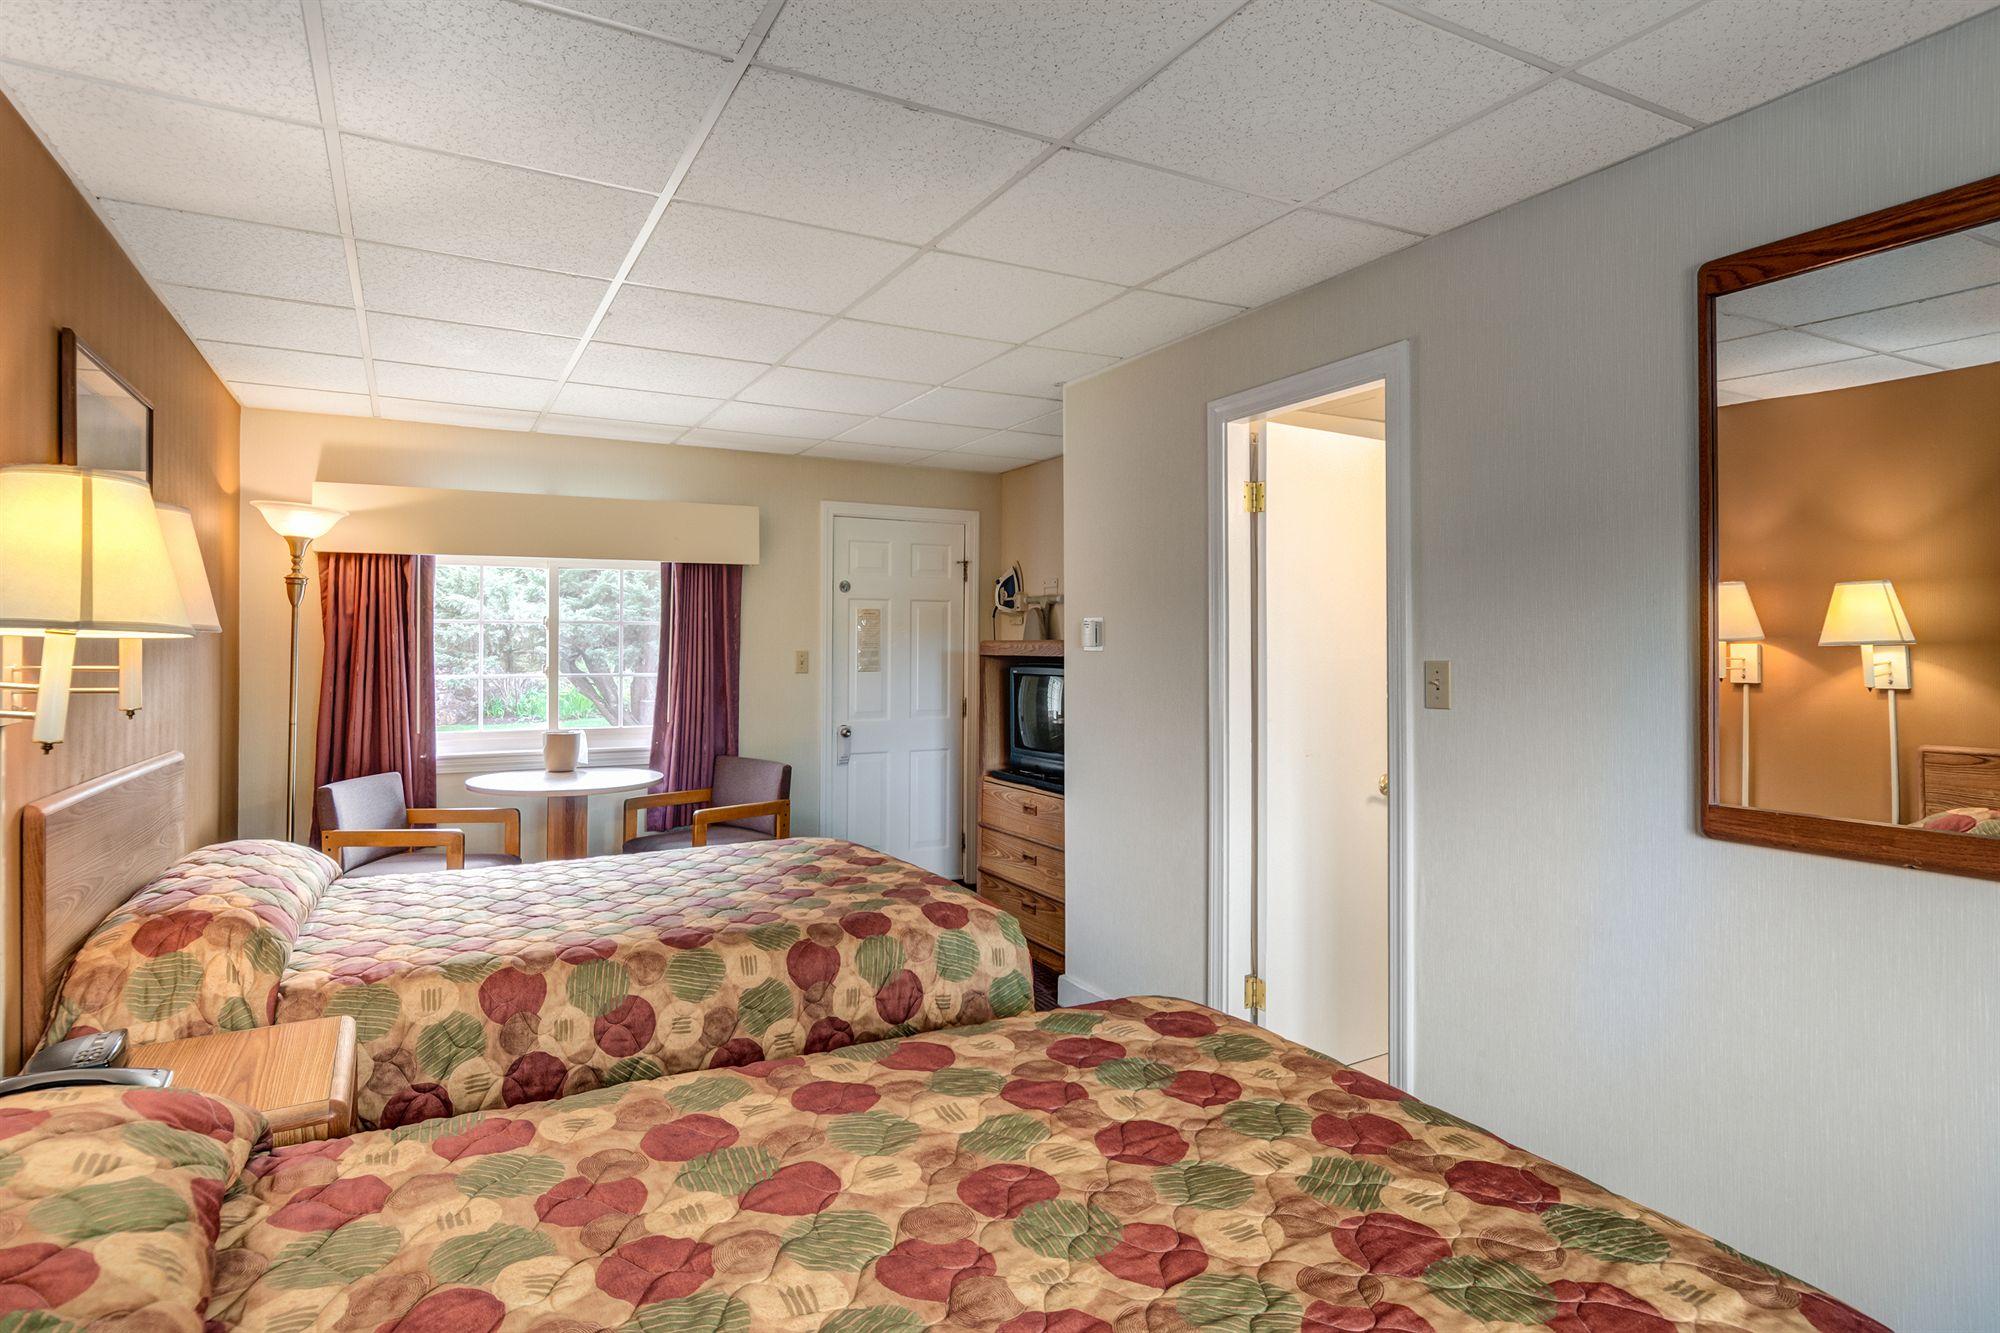 Anchorage Inn of Rochester